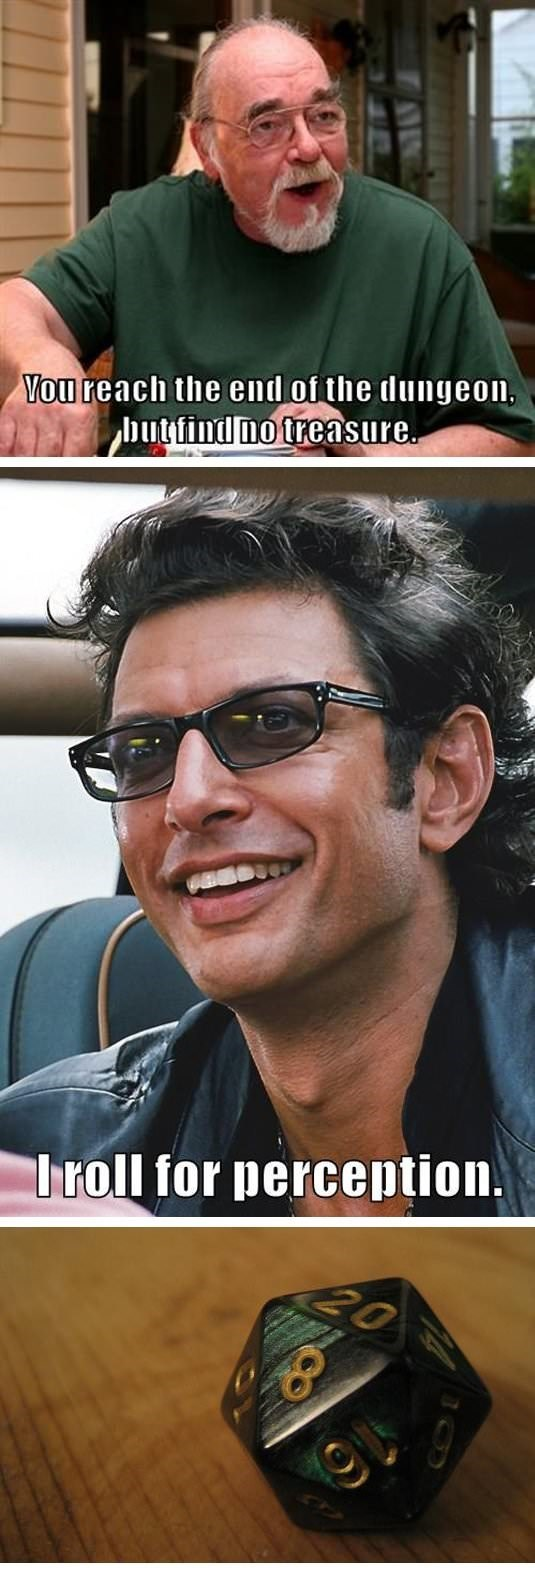 dd meme about Jeff Goldblum rolling high on perception to find treasure